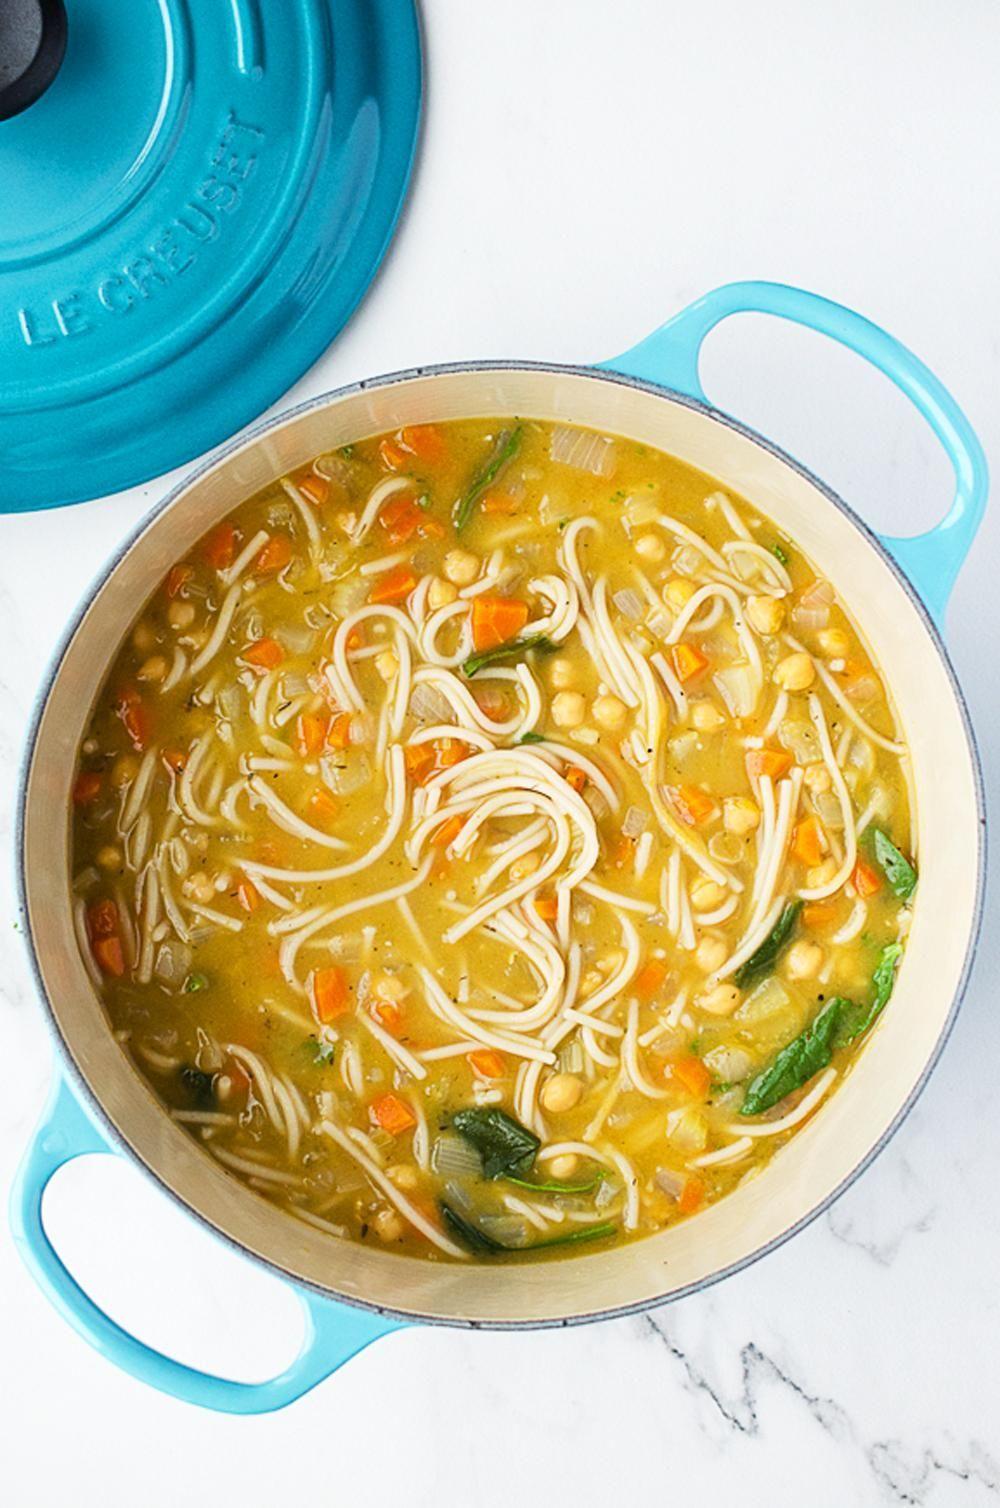 Rise Shine Cook - 30 Minute Vegan Chickpea Noodle Soup-Chickpea Soup For The Soul (& The Sick!) #chickpeanoodlesoup Rise Shine Cook - 30 Minute Vegan Chickpea Noodle Soup-Chickpea Soup For The Soul (& The Sick!) #chickpeanoodlesoup